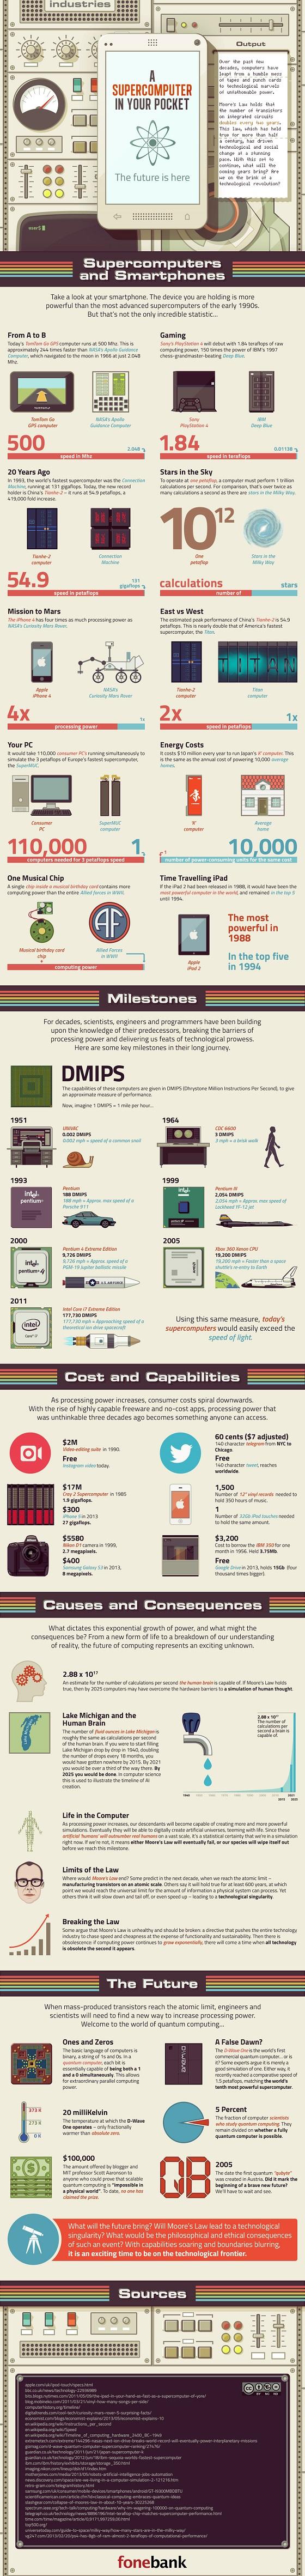 supercomputer pocket